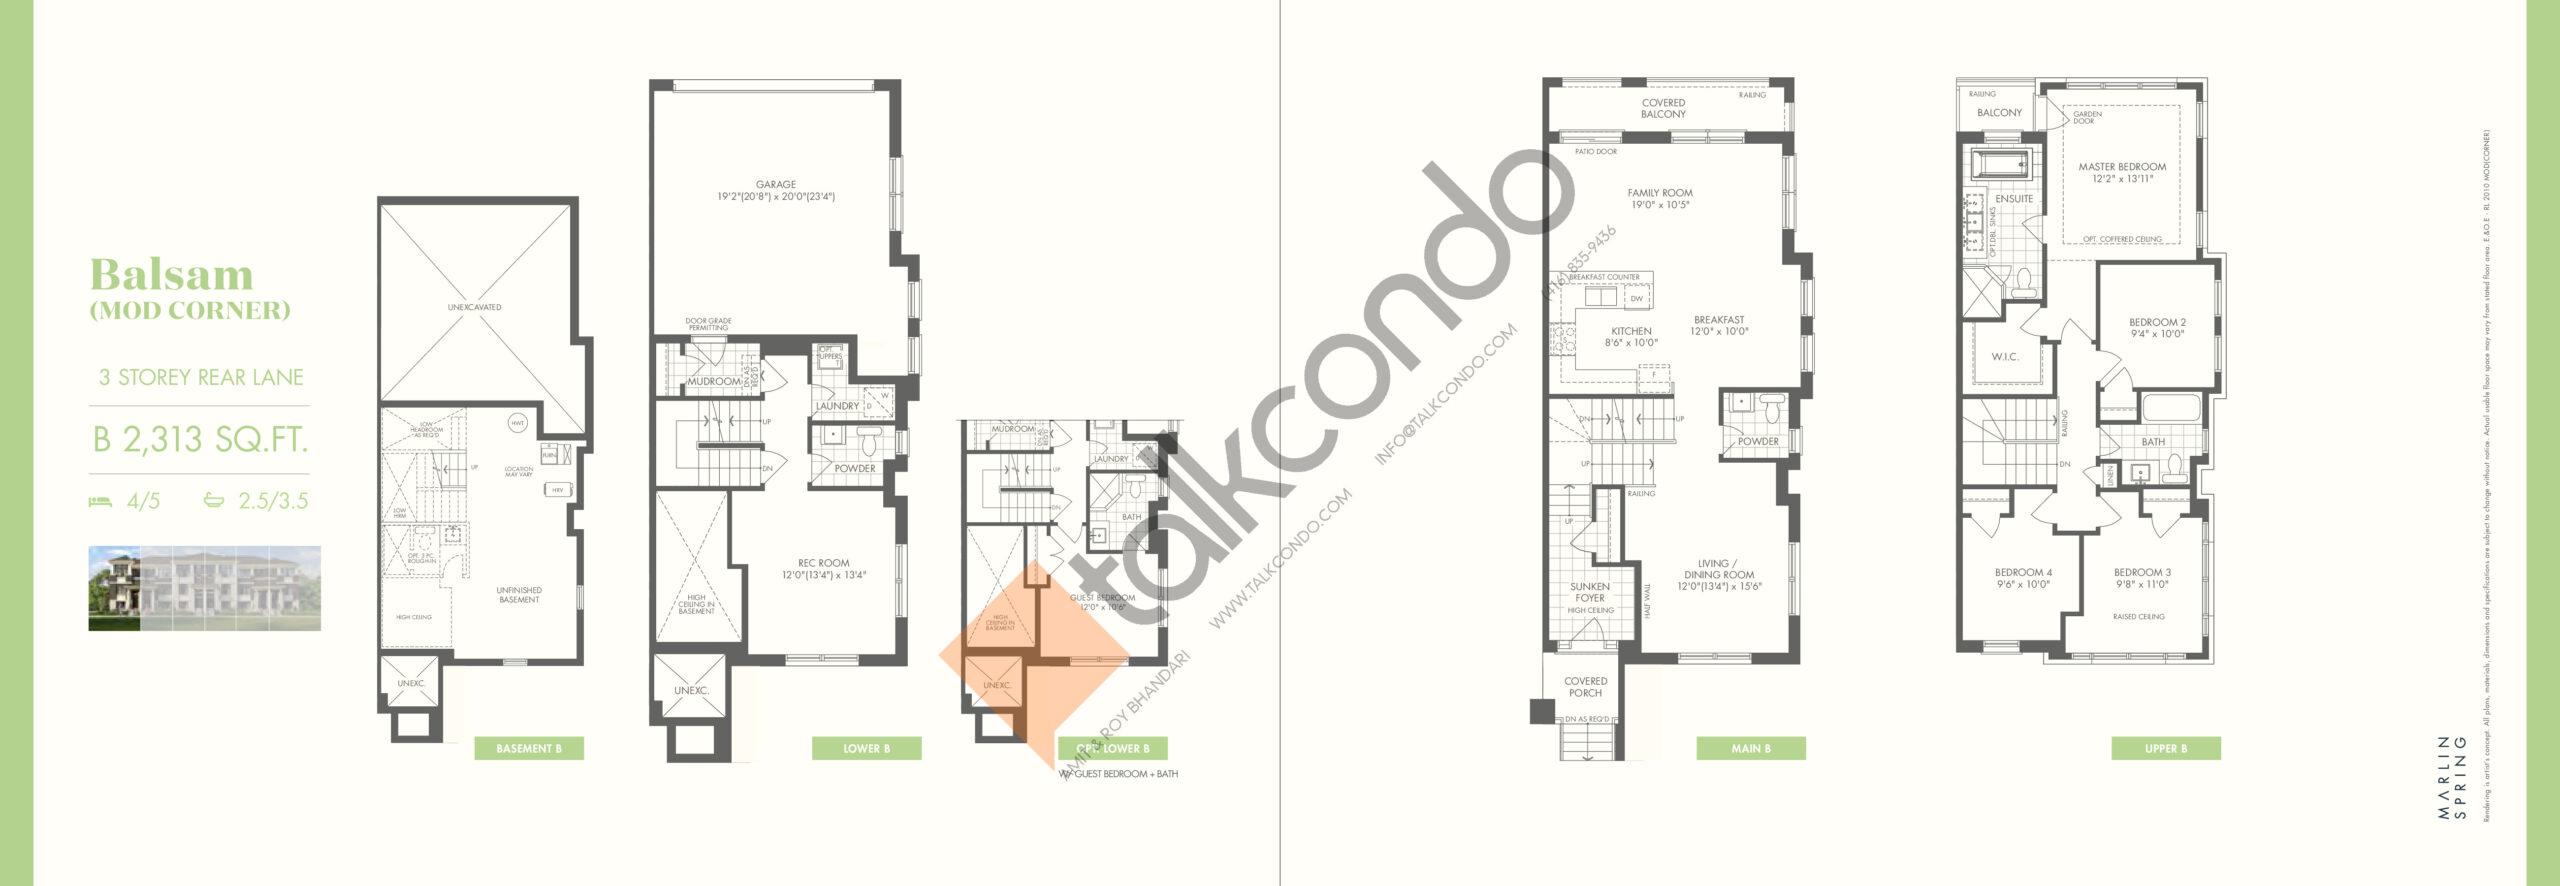 Balsam (Mod Corner) B Floor Plan at Ivylea Towns - 2313 sq.ft